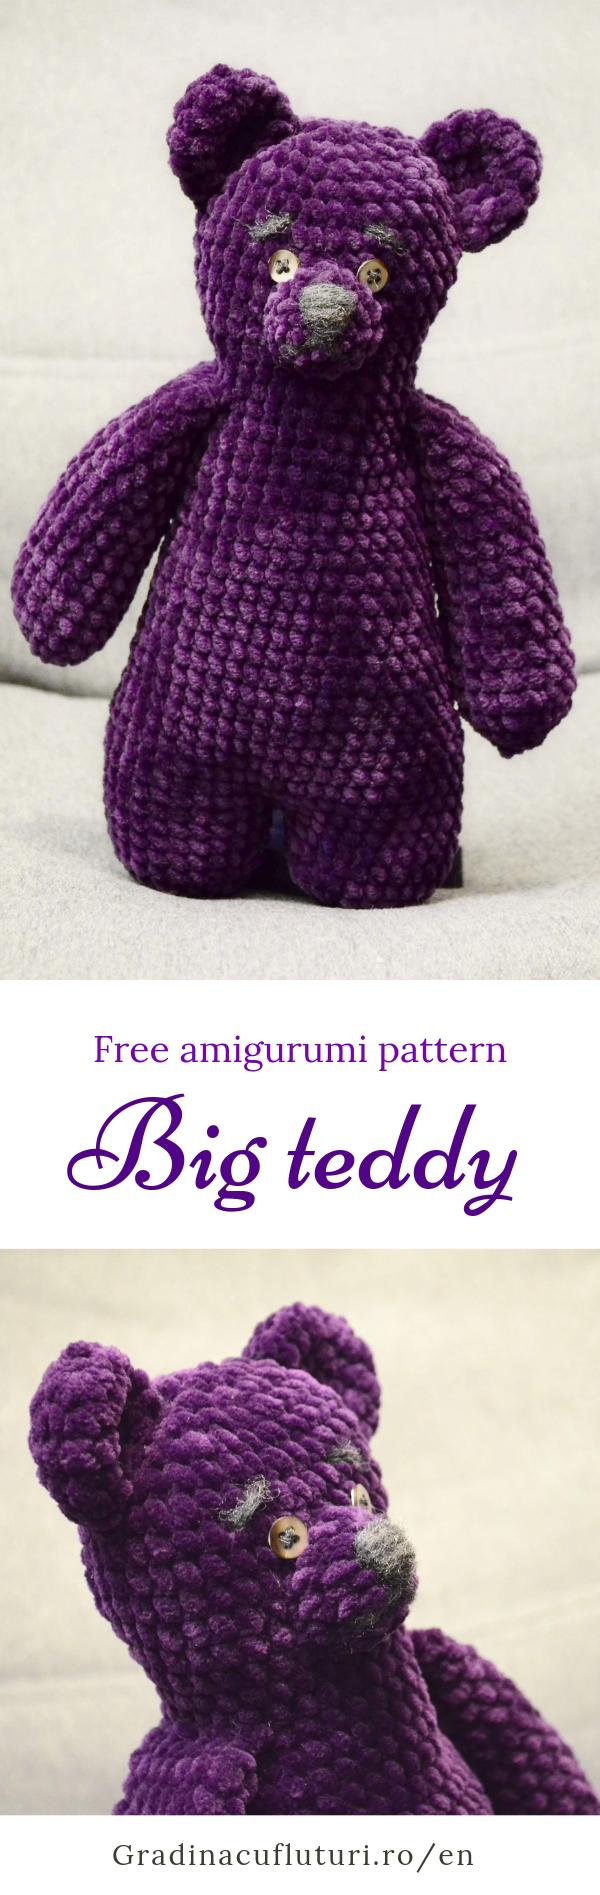 pinterest big teddy amigurumi free pattern